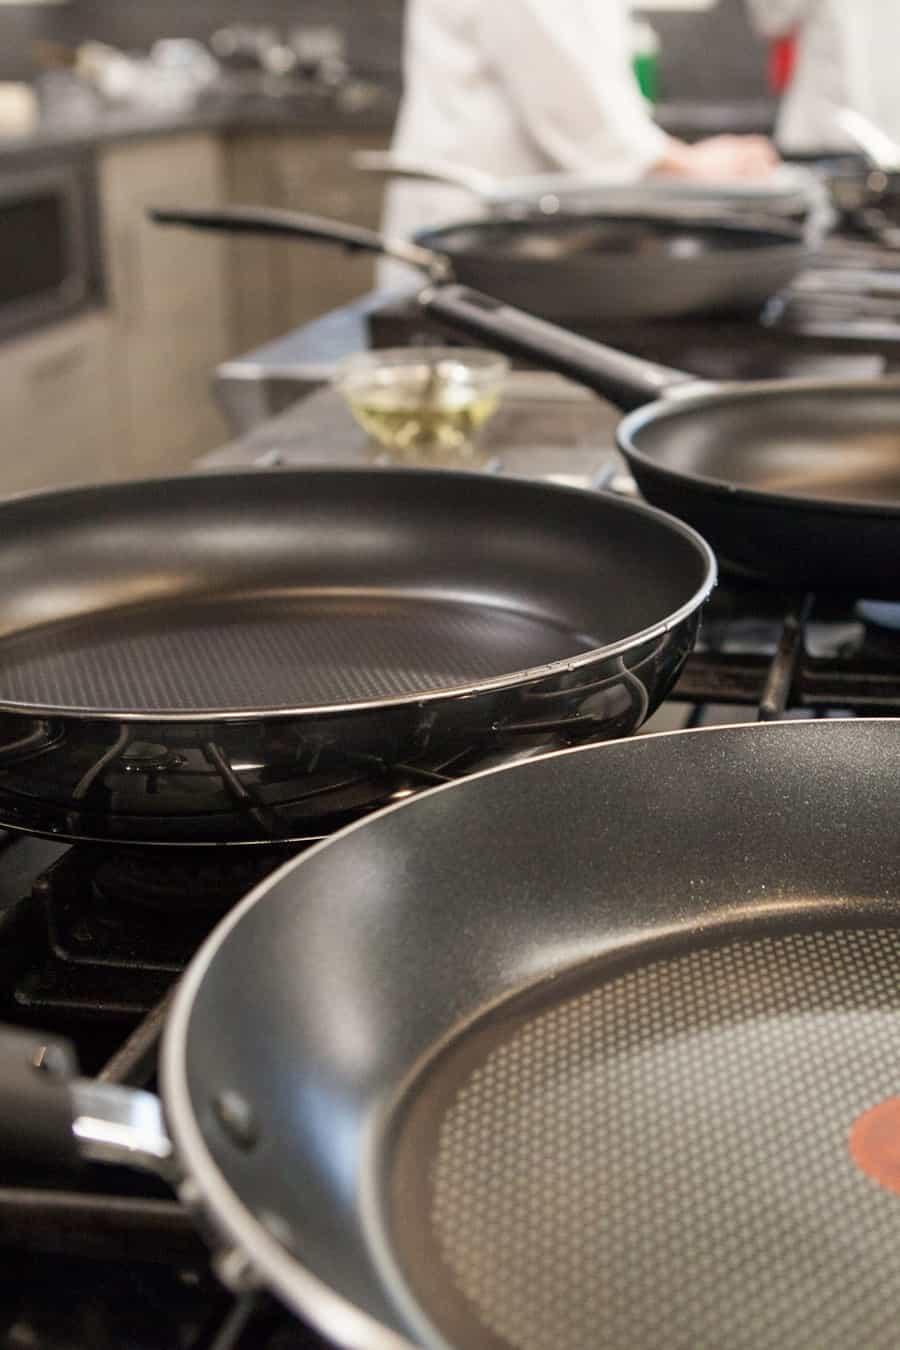 stainless steel pan vs nonstick